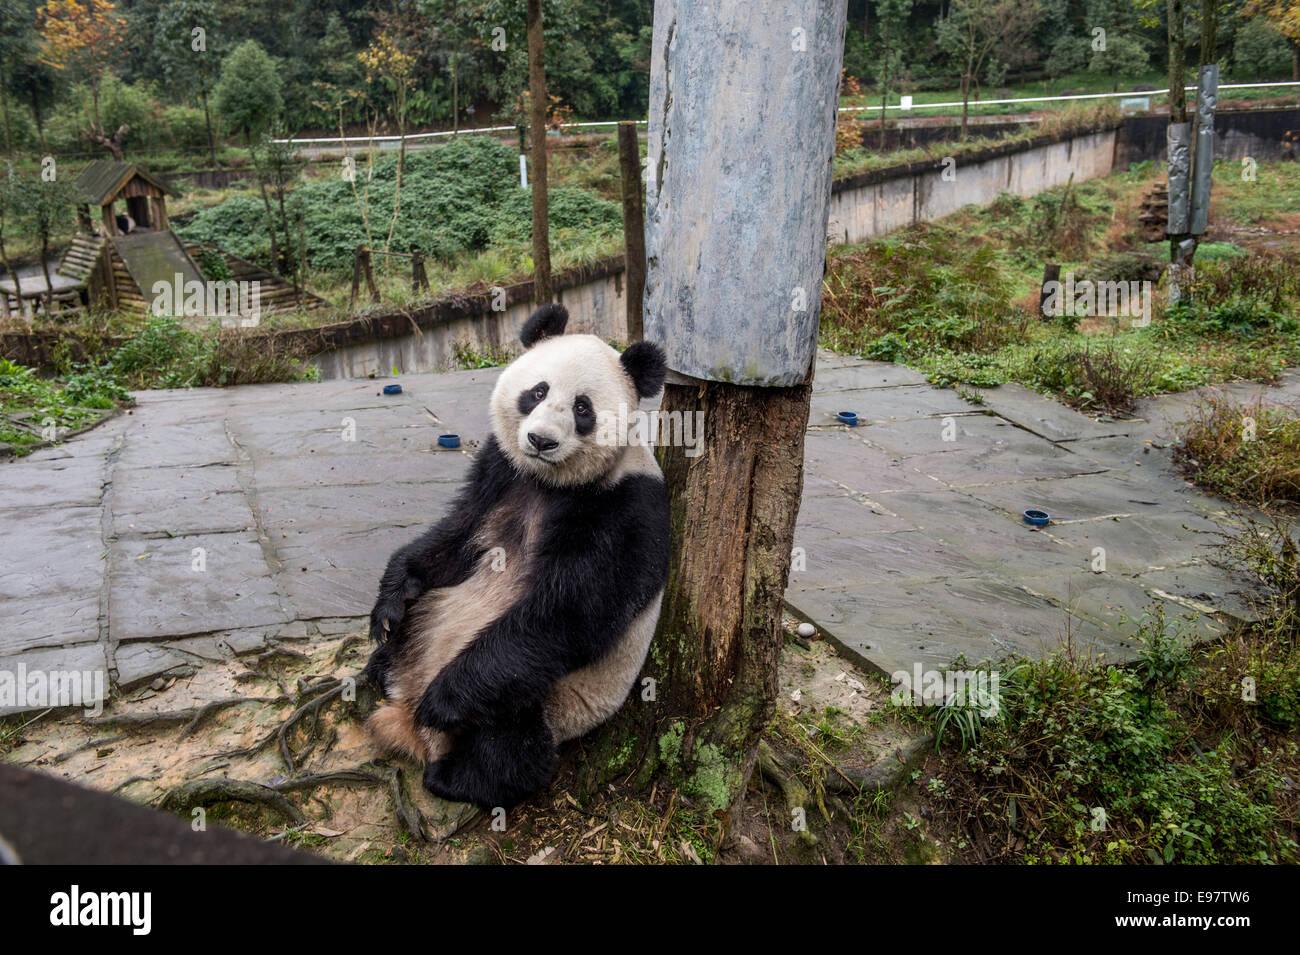 An adult captive panda in Ya'an, Sichuan, China. (Photo by Ami Vitale) - Stock Image